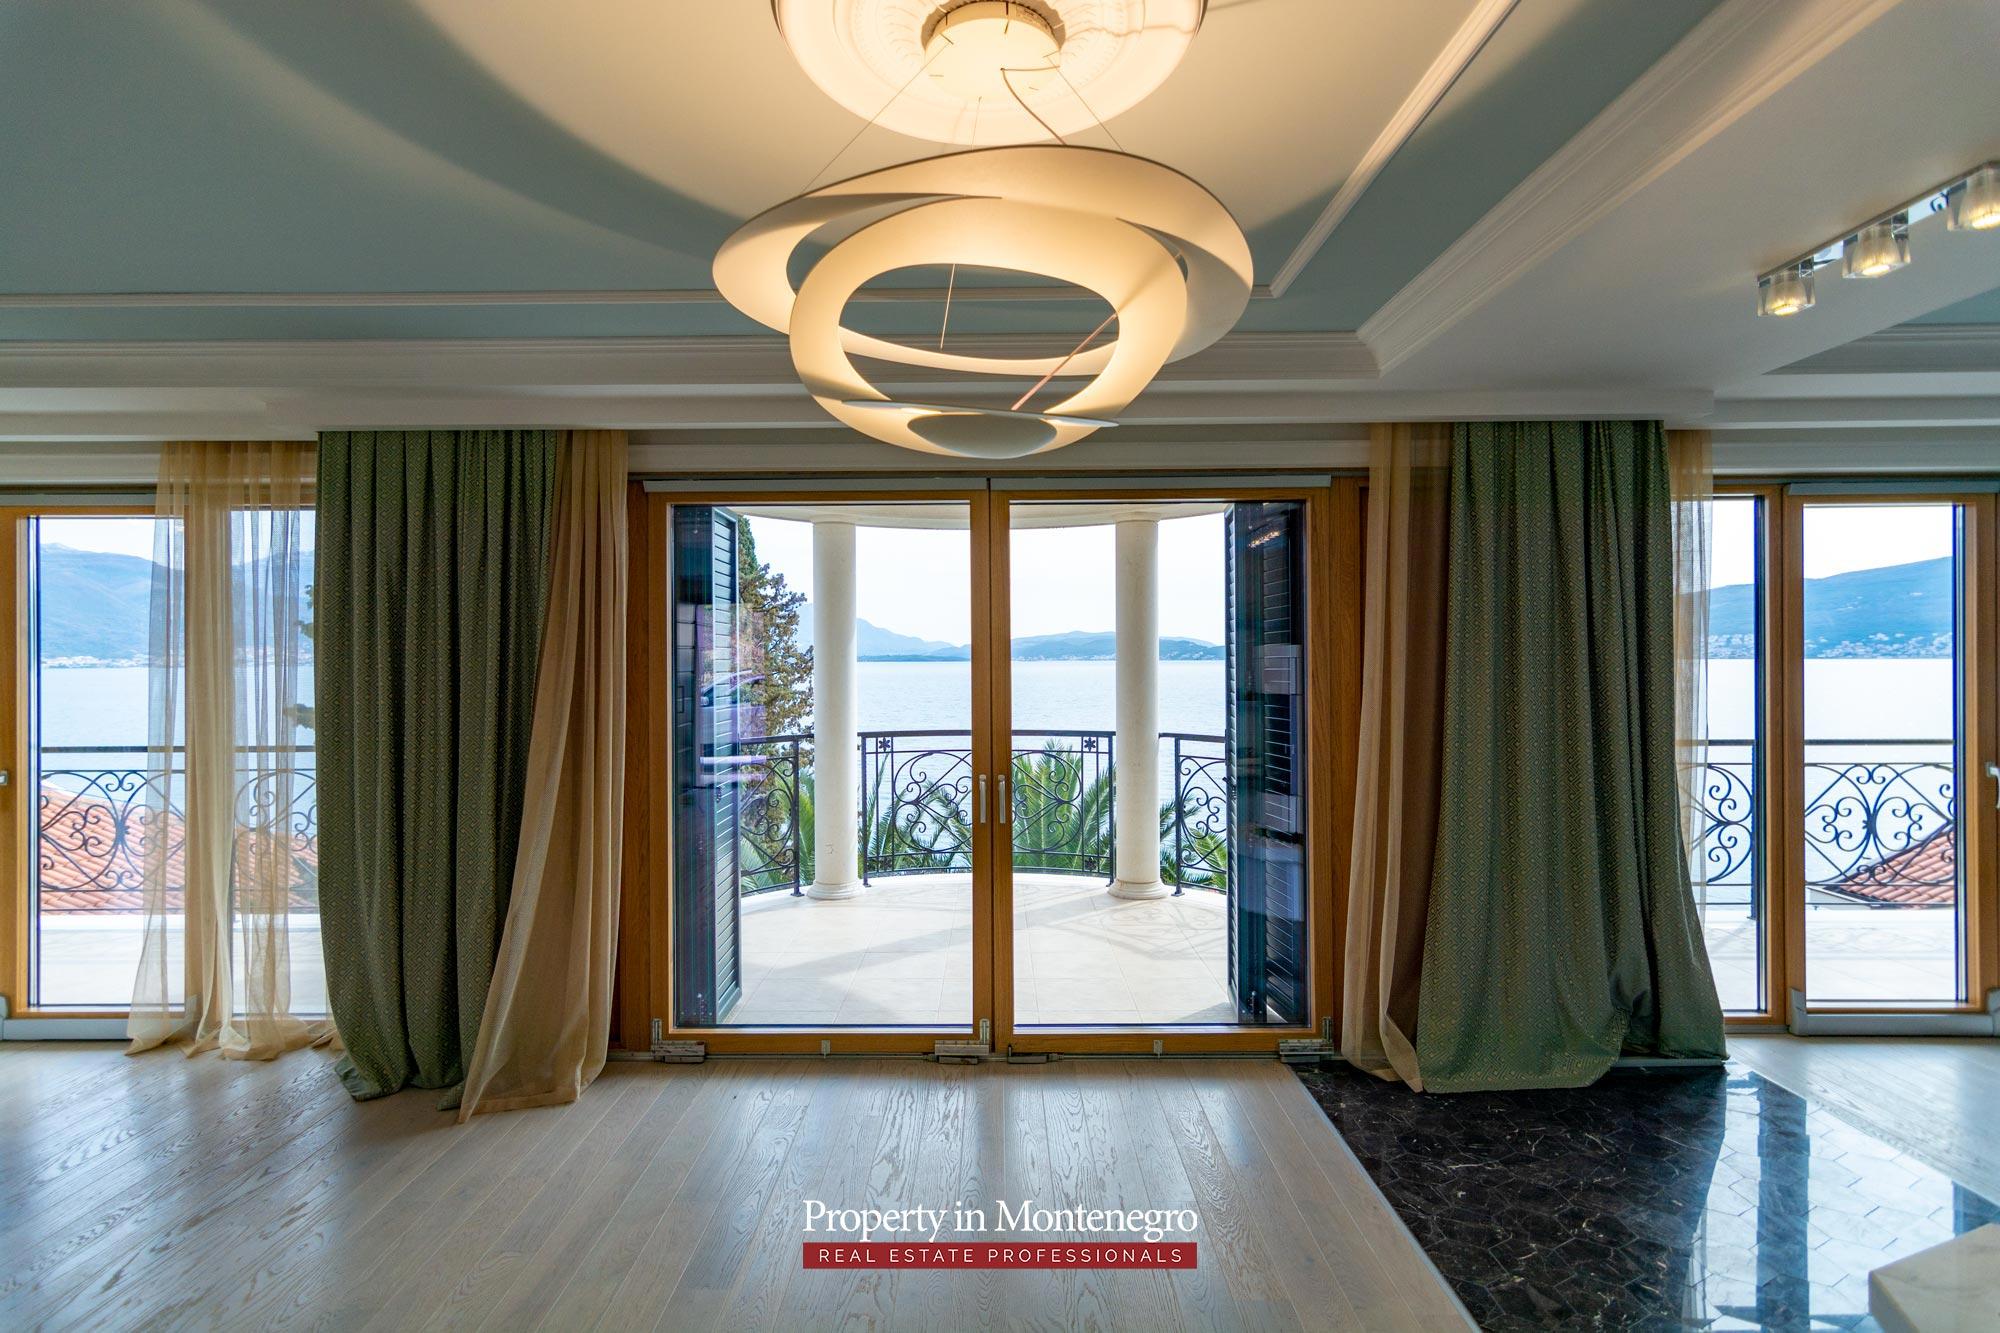 Luxury waterfront villa in Montenegro